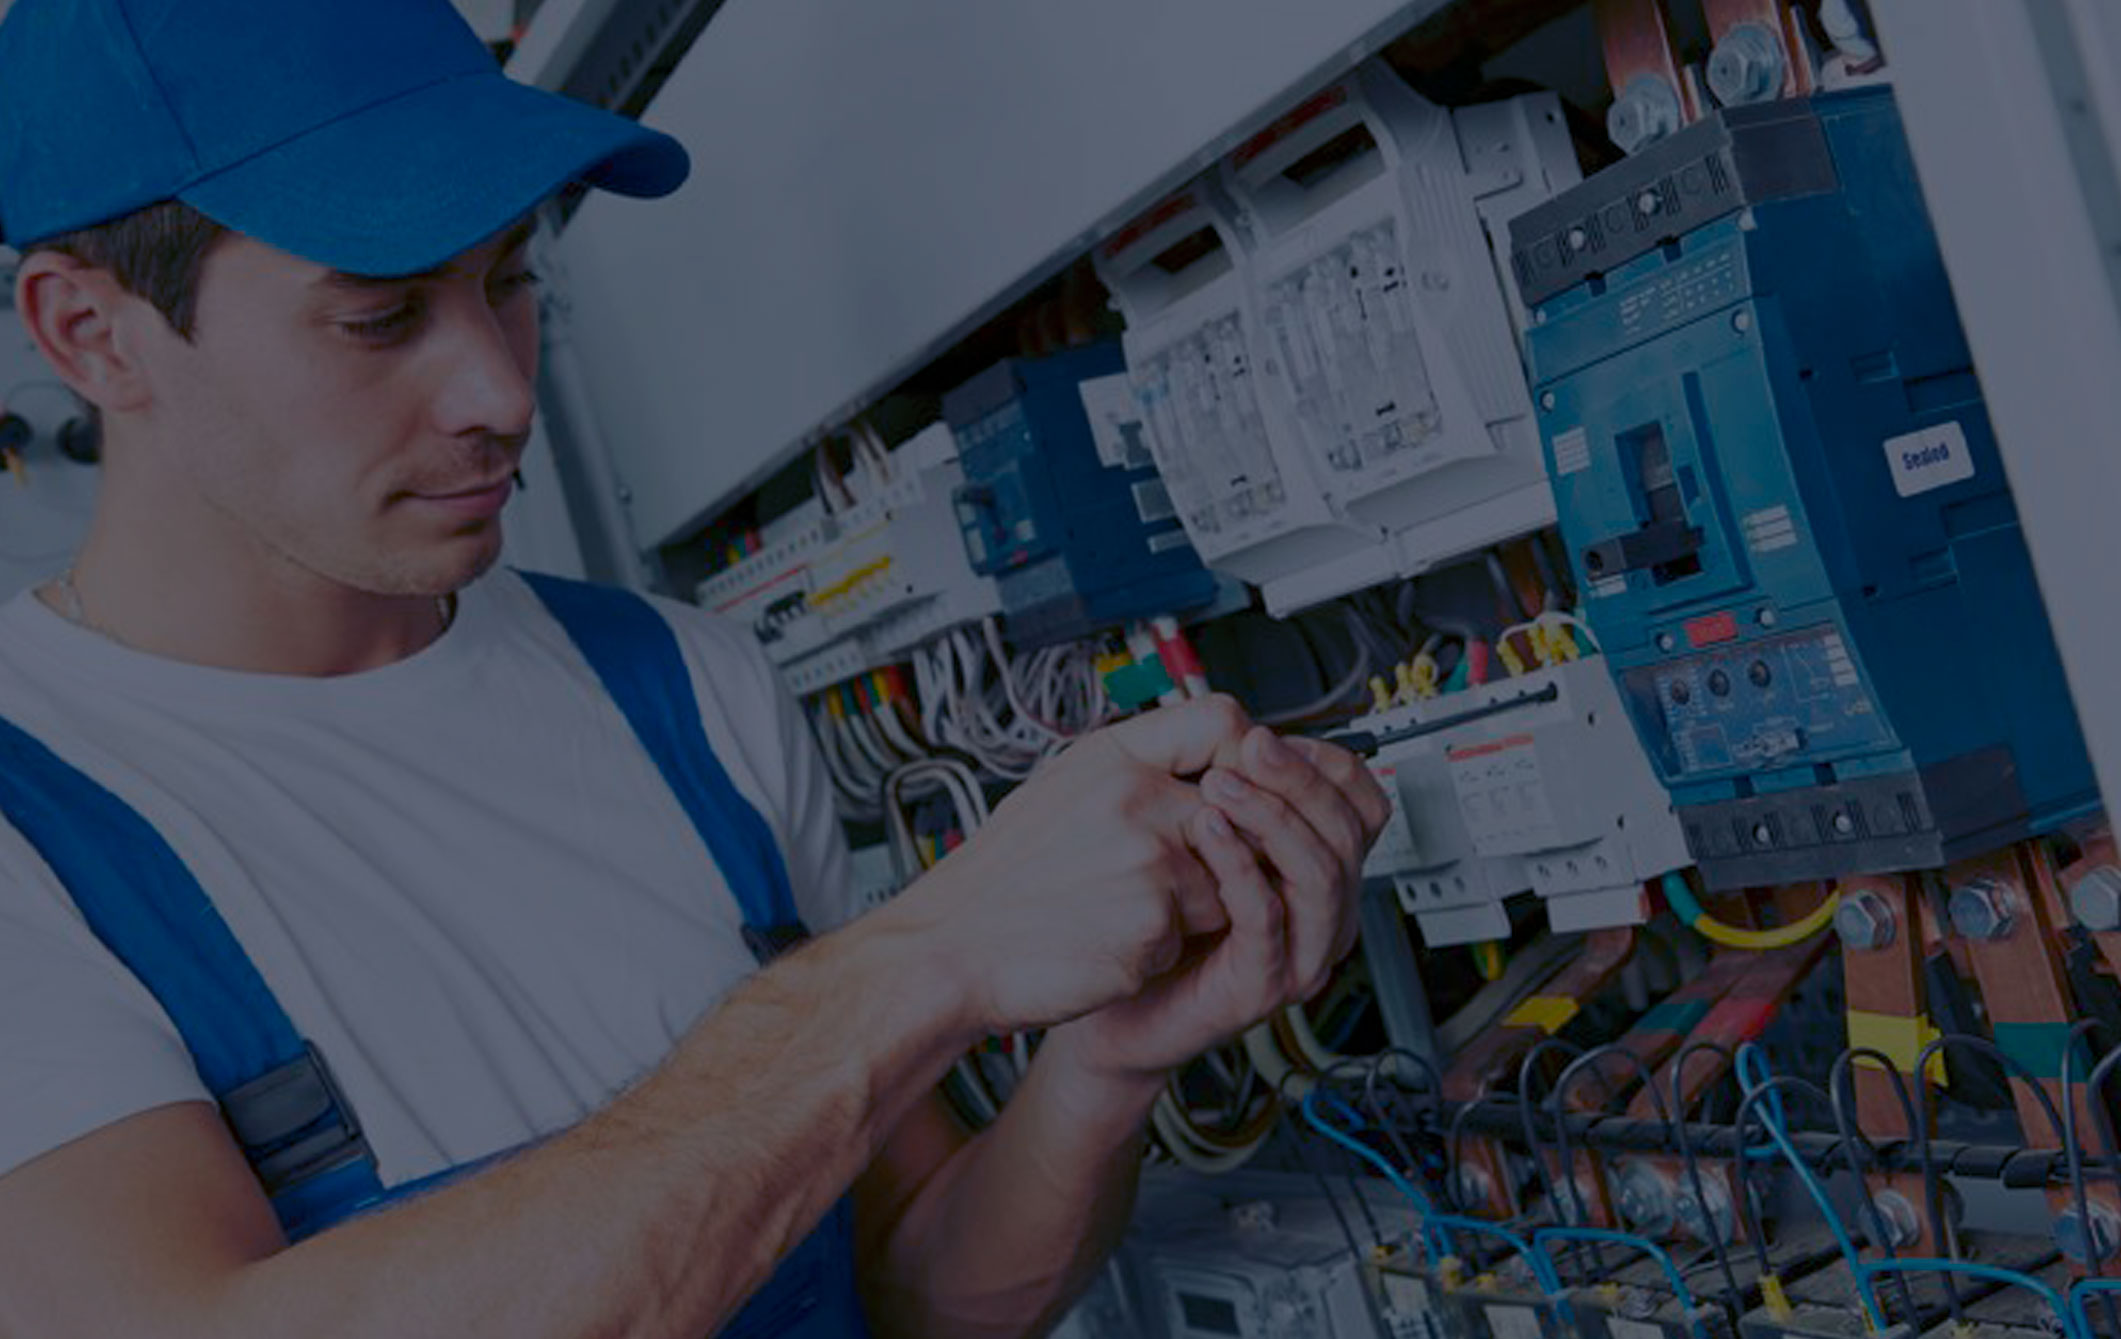 Электромонтер по ремонту и обслуживанию электрооборудования